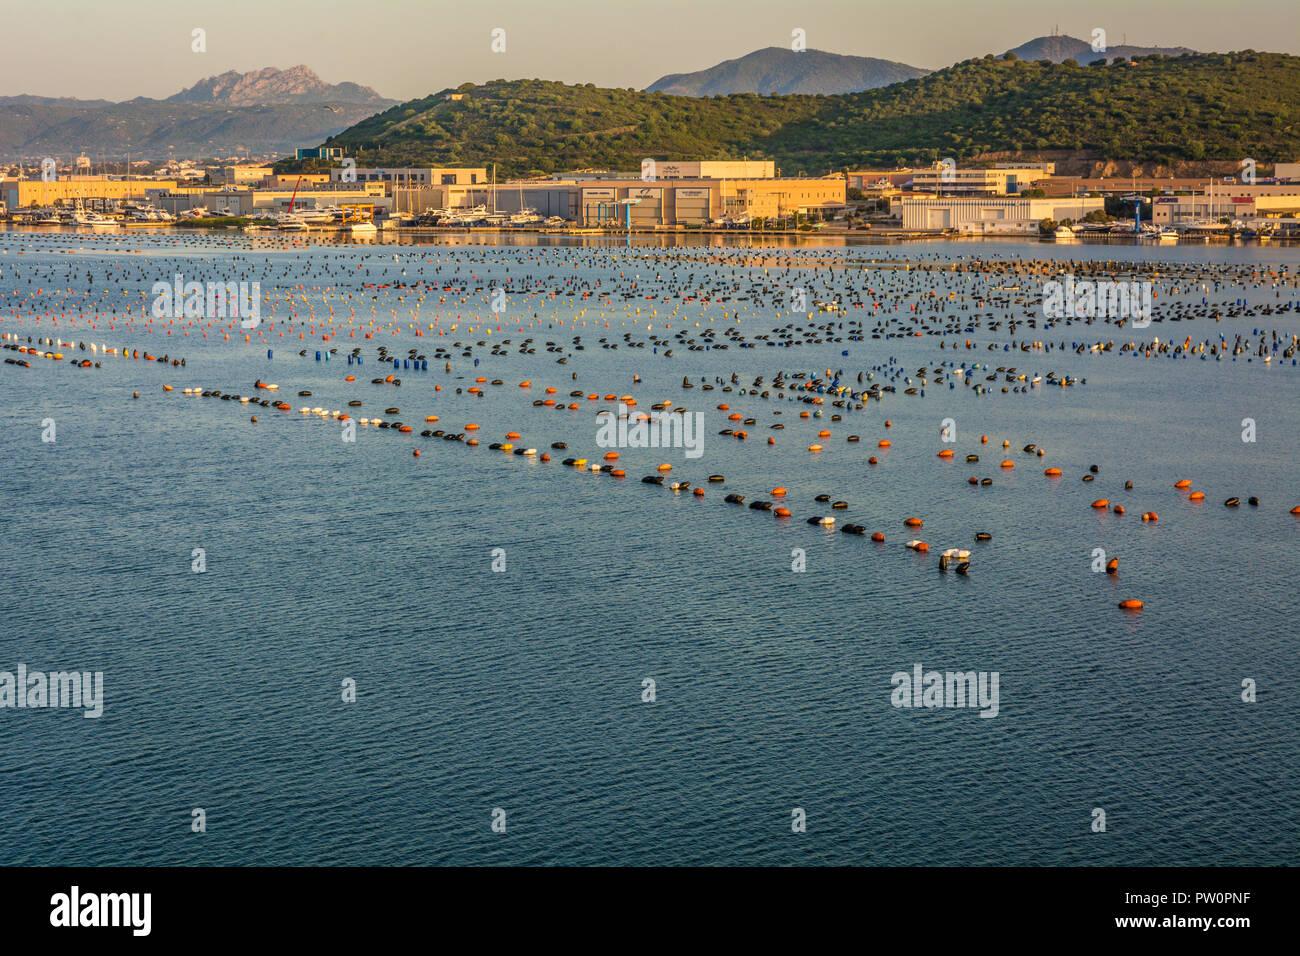 Olbia in Sardinia. Landscape around Olbia, view from cruise ship arriving into the Olbia harbor in Sardinia island, morning scene - Stock Image